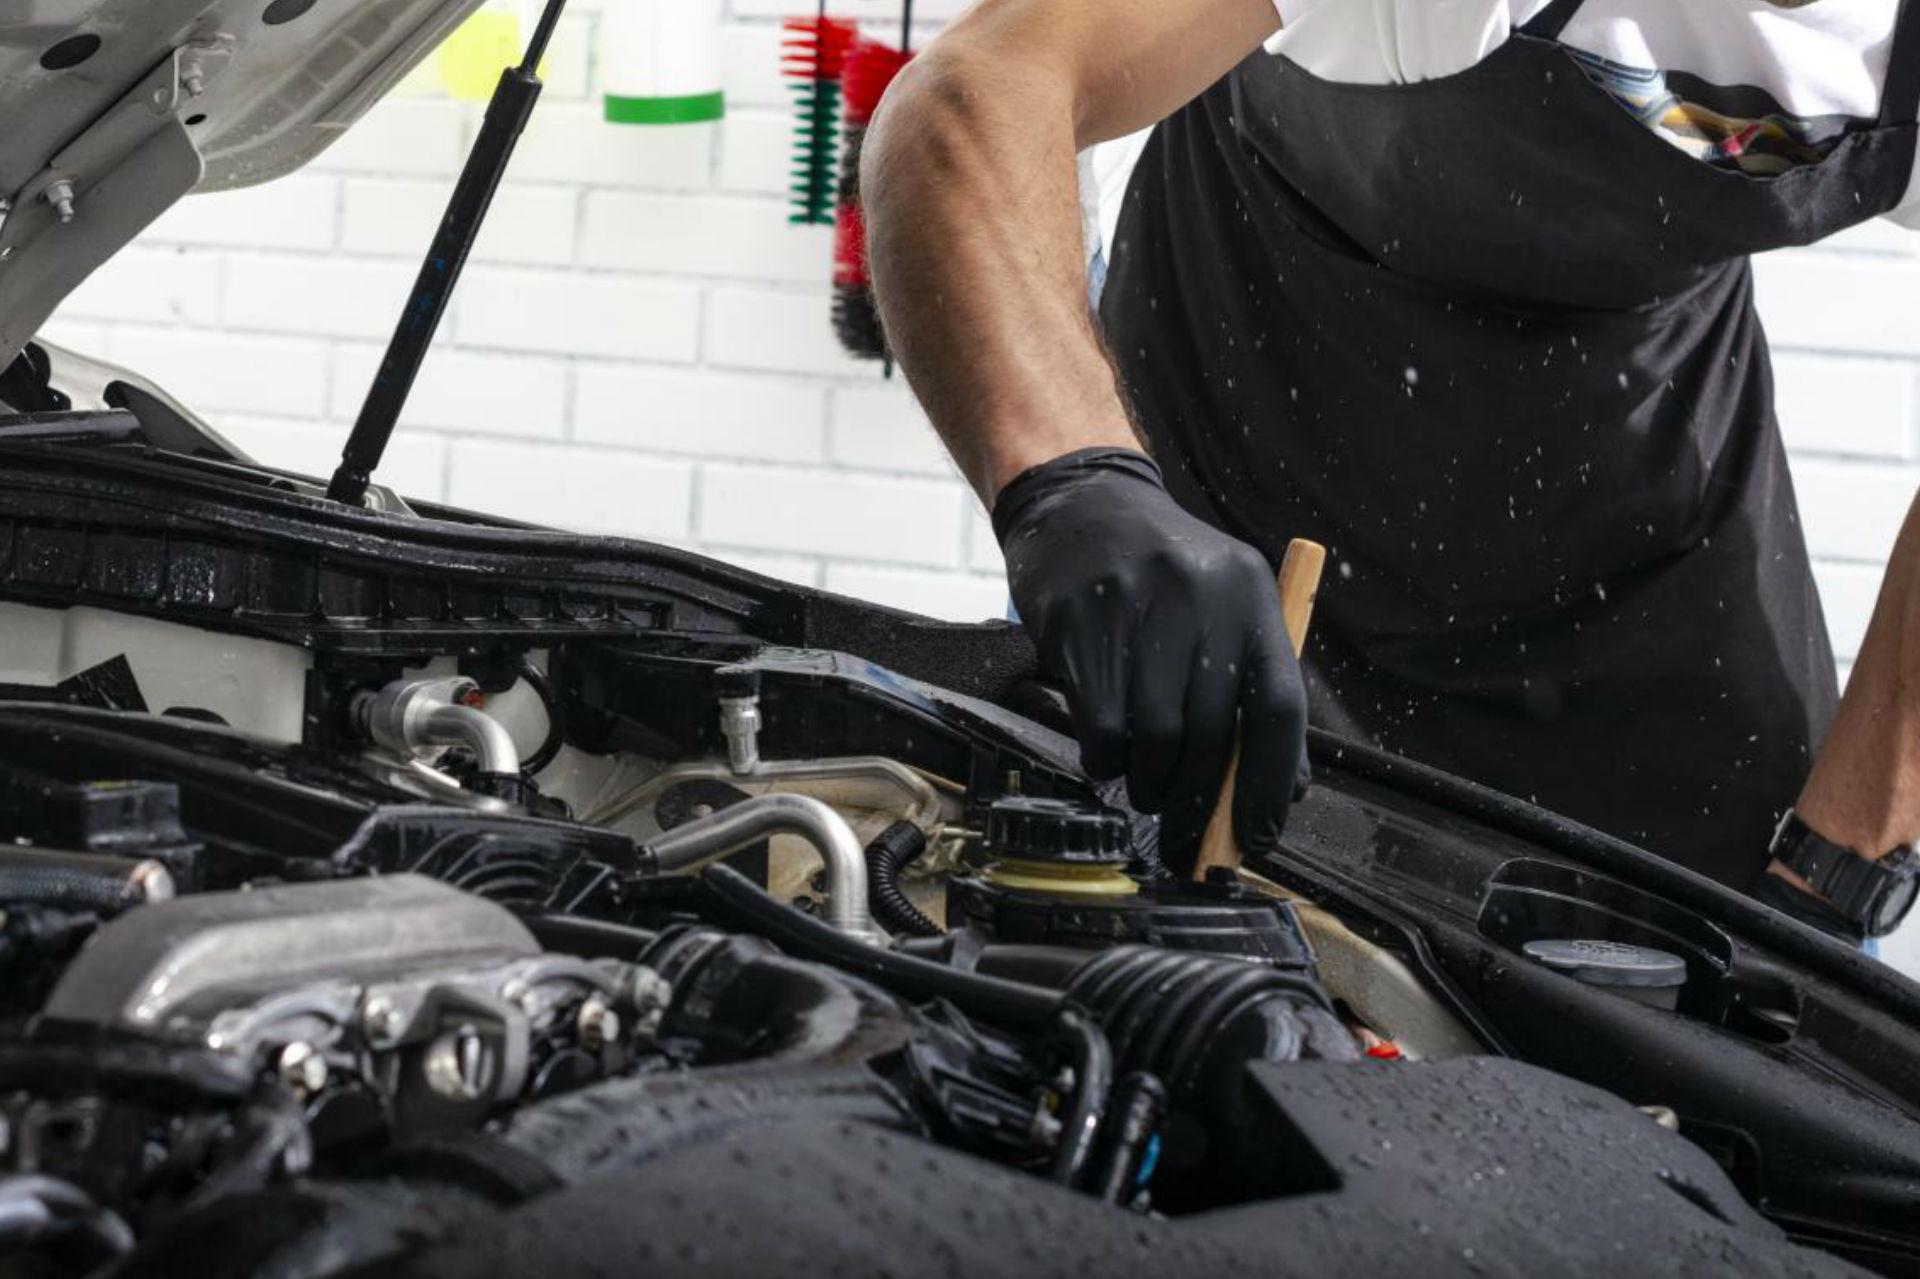 car-detailing-maintenance-cleaning-engine-high-MBP8UW7-cuad